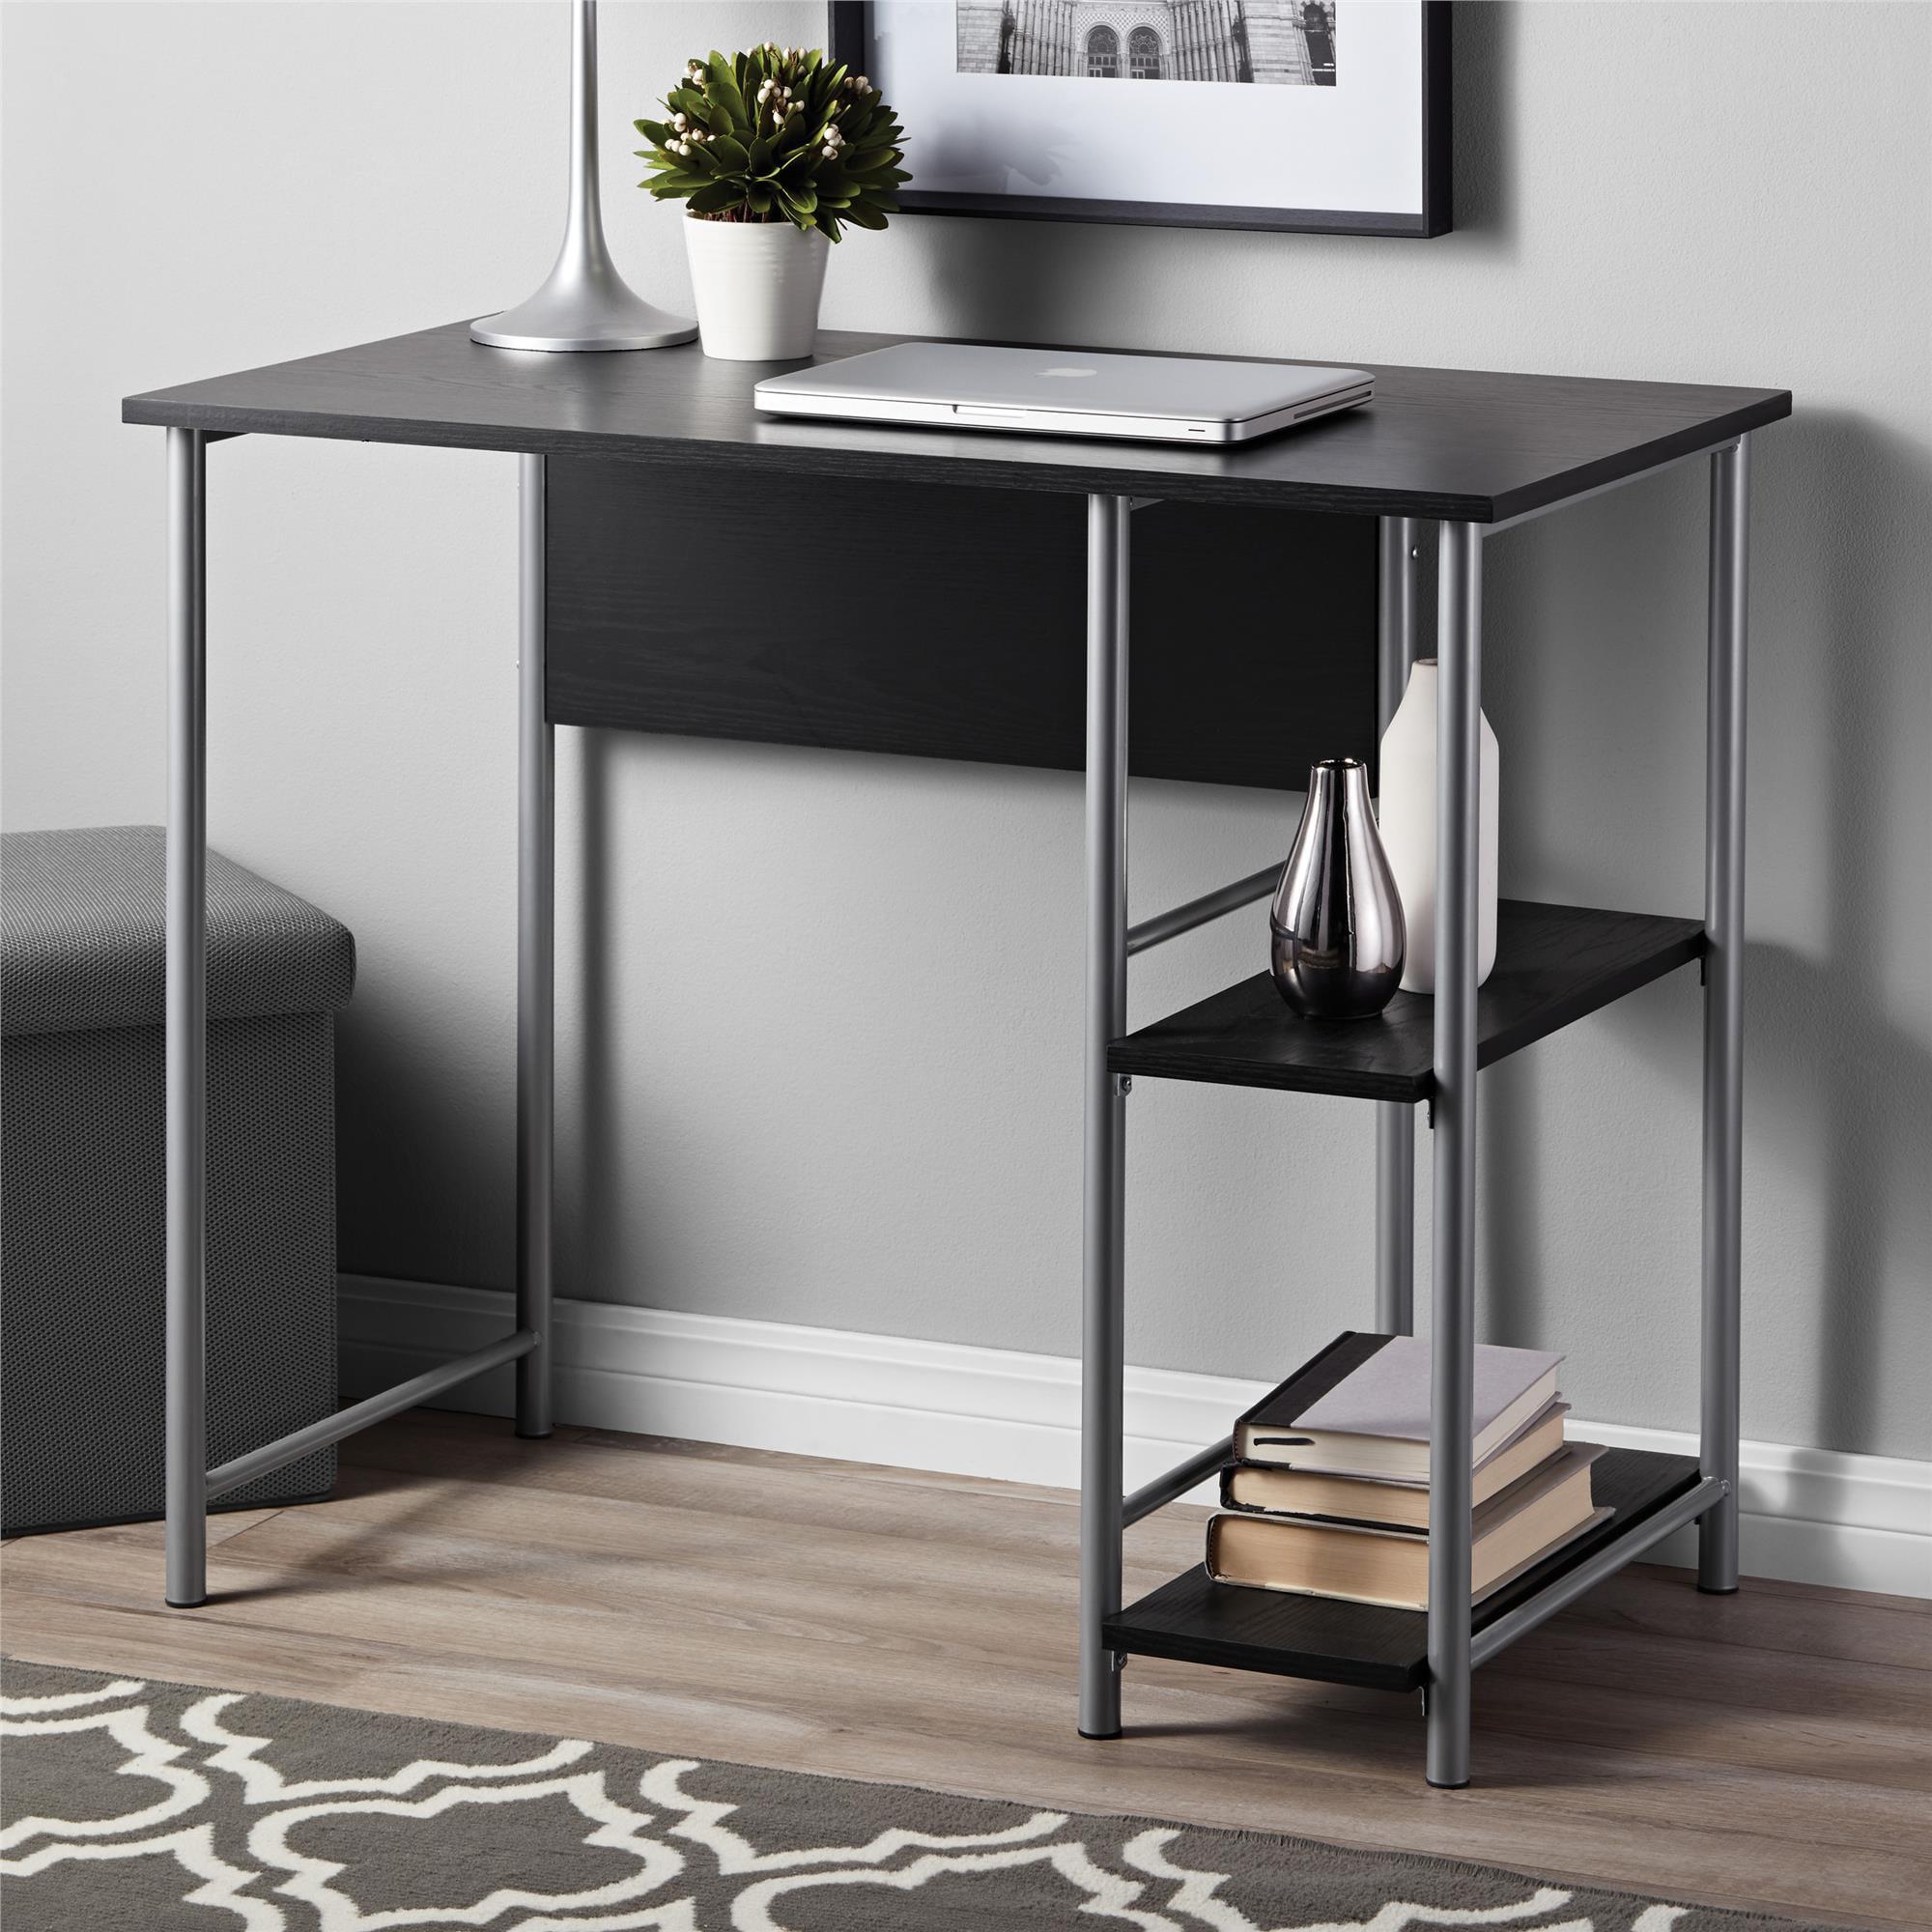 Mainstays Basic Student Desk, Black Oak